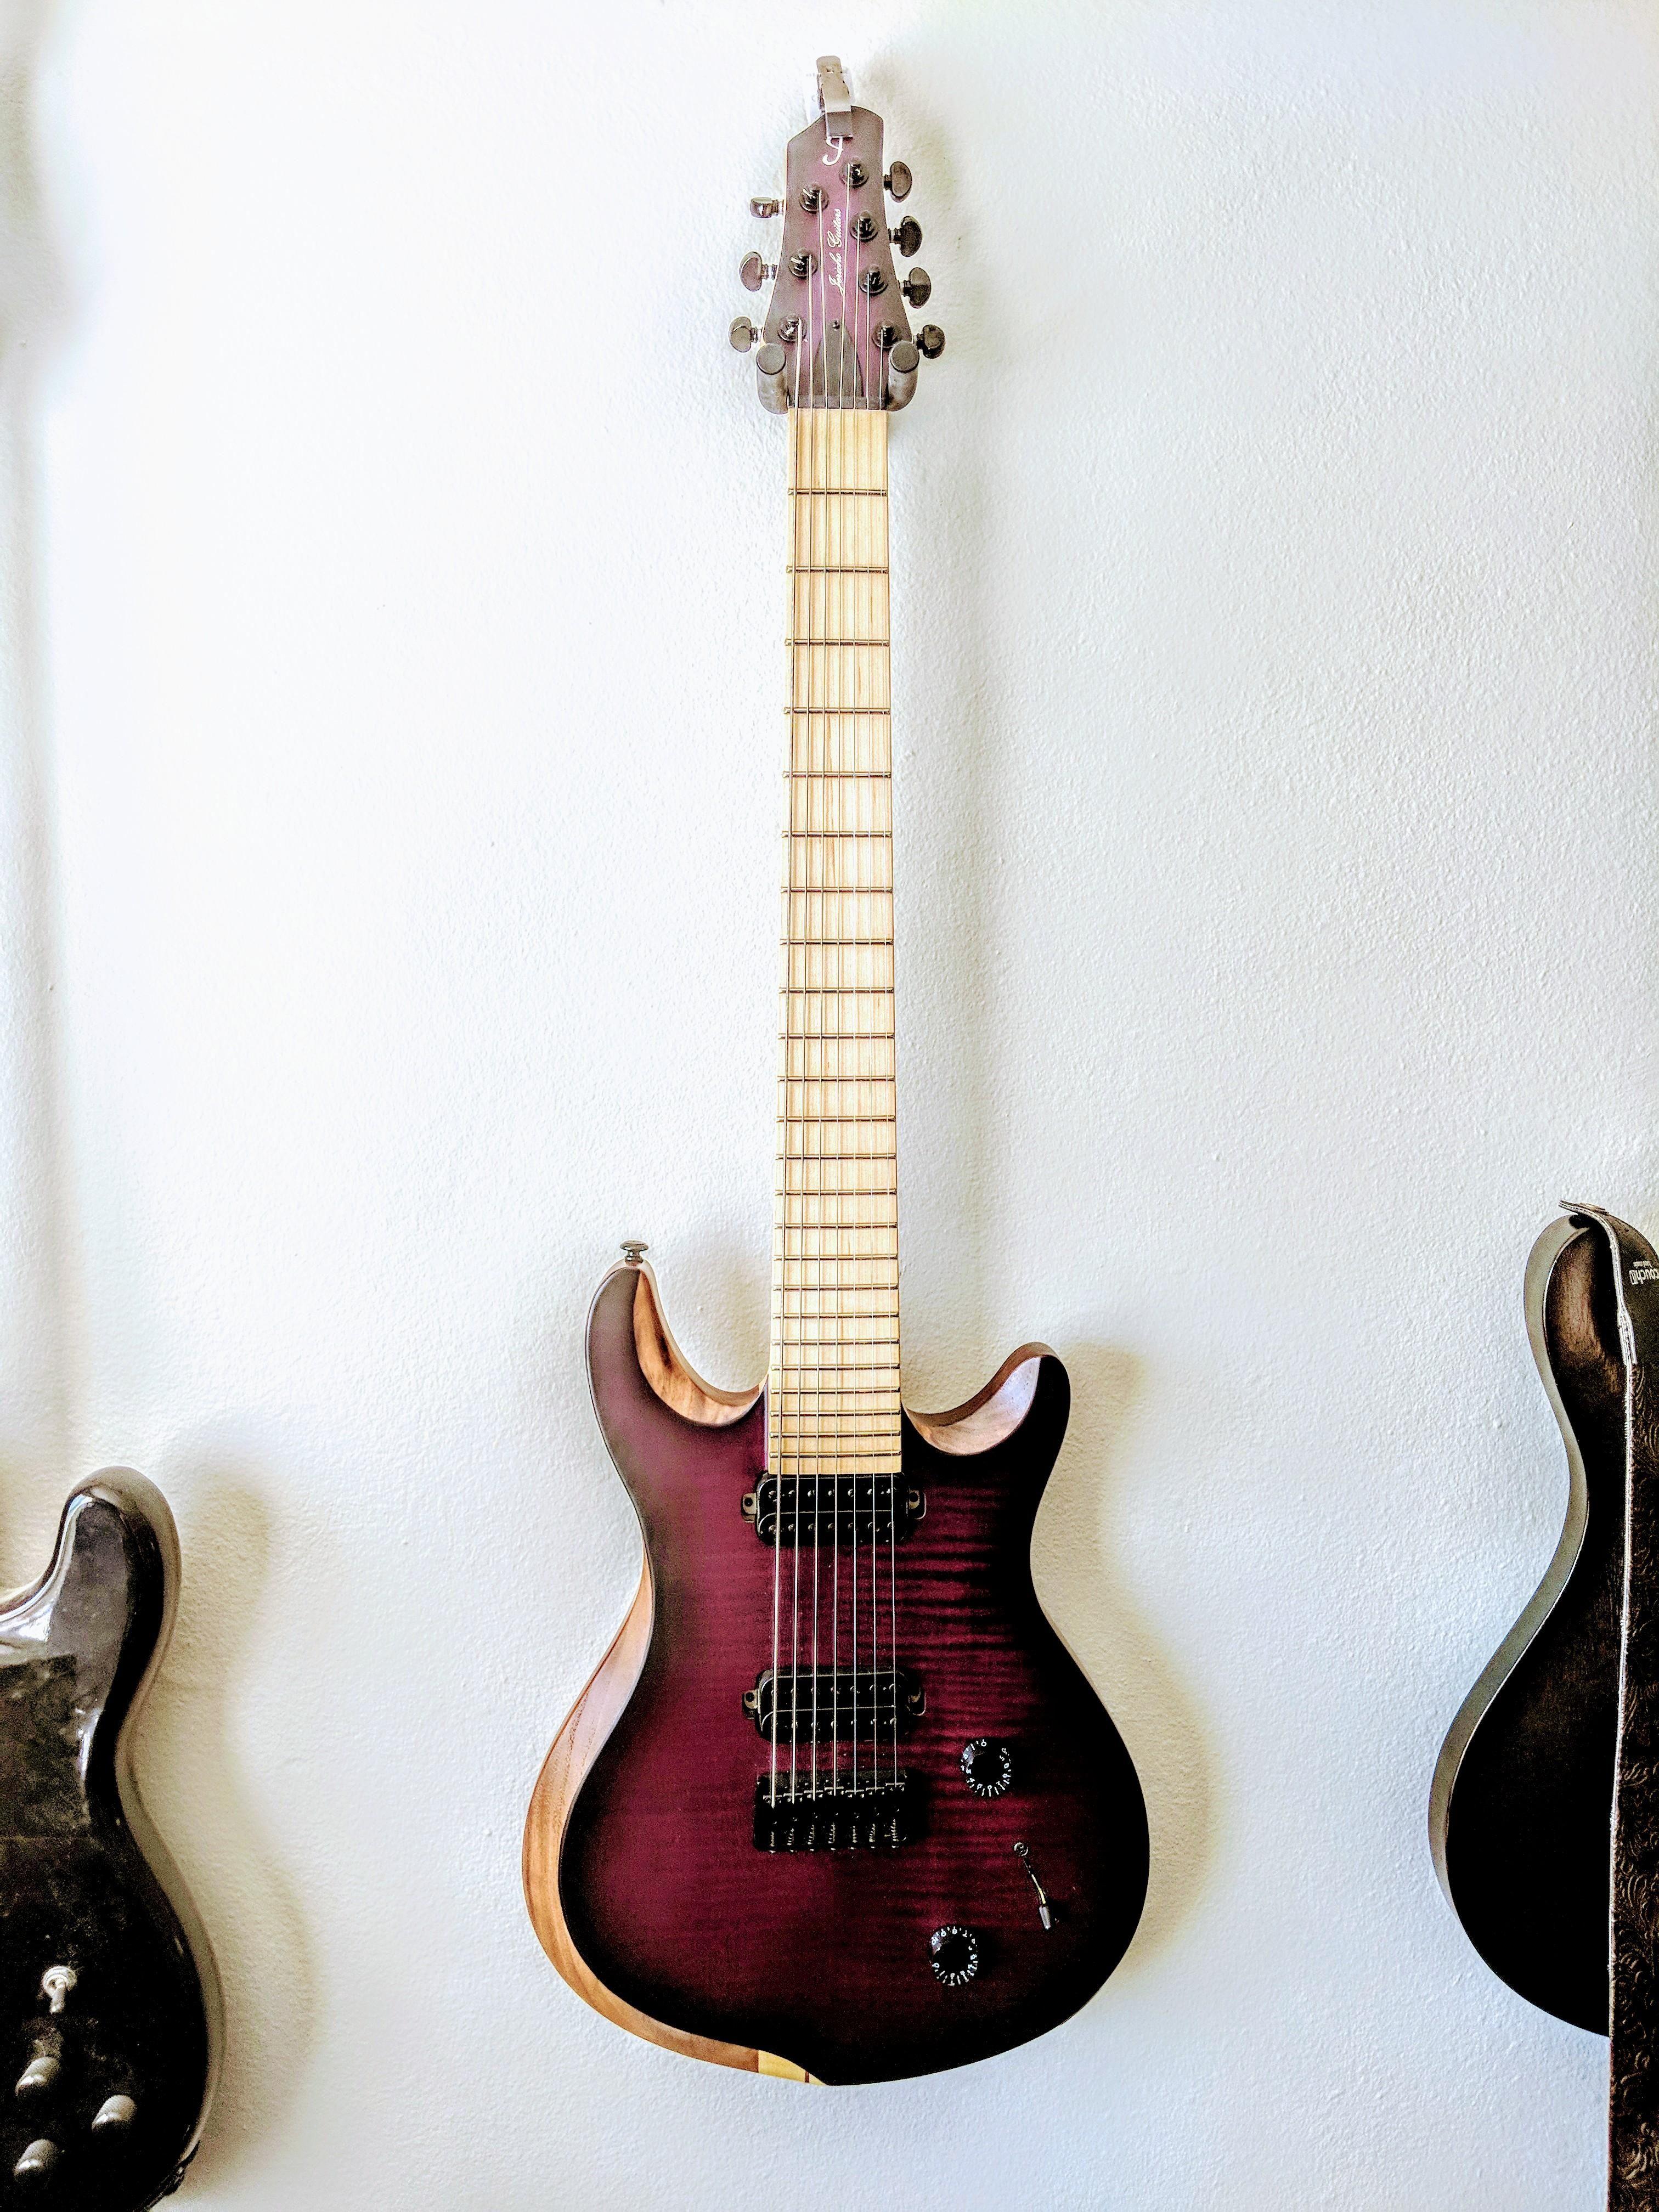 Ngd Jericho Edge 7 Nt Guitar Design Guitar Jericho